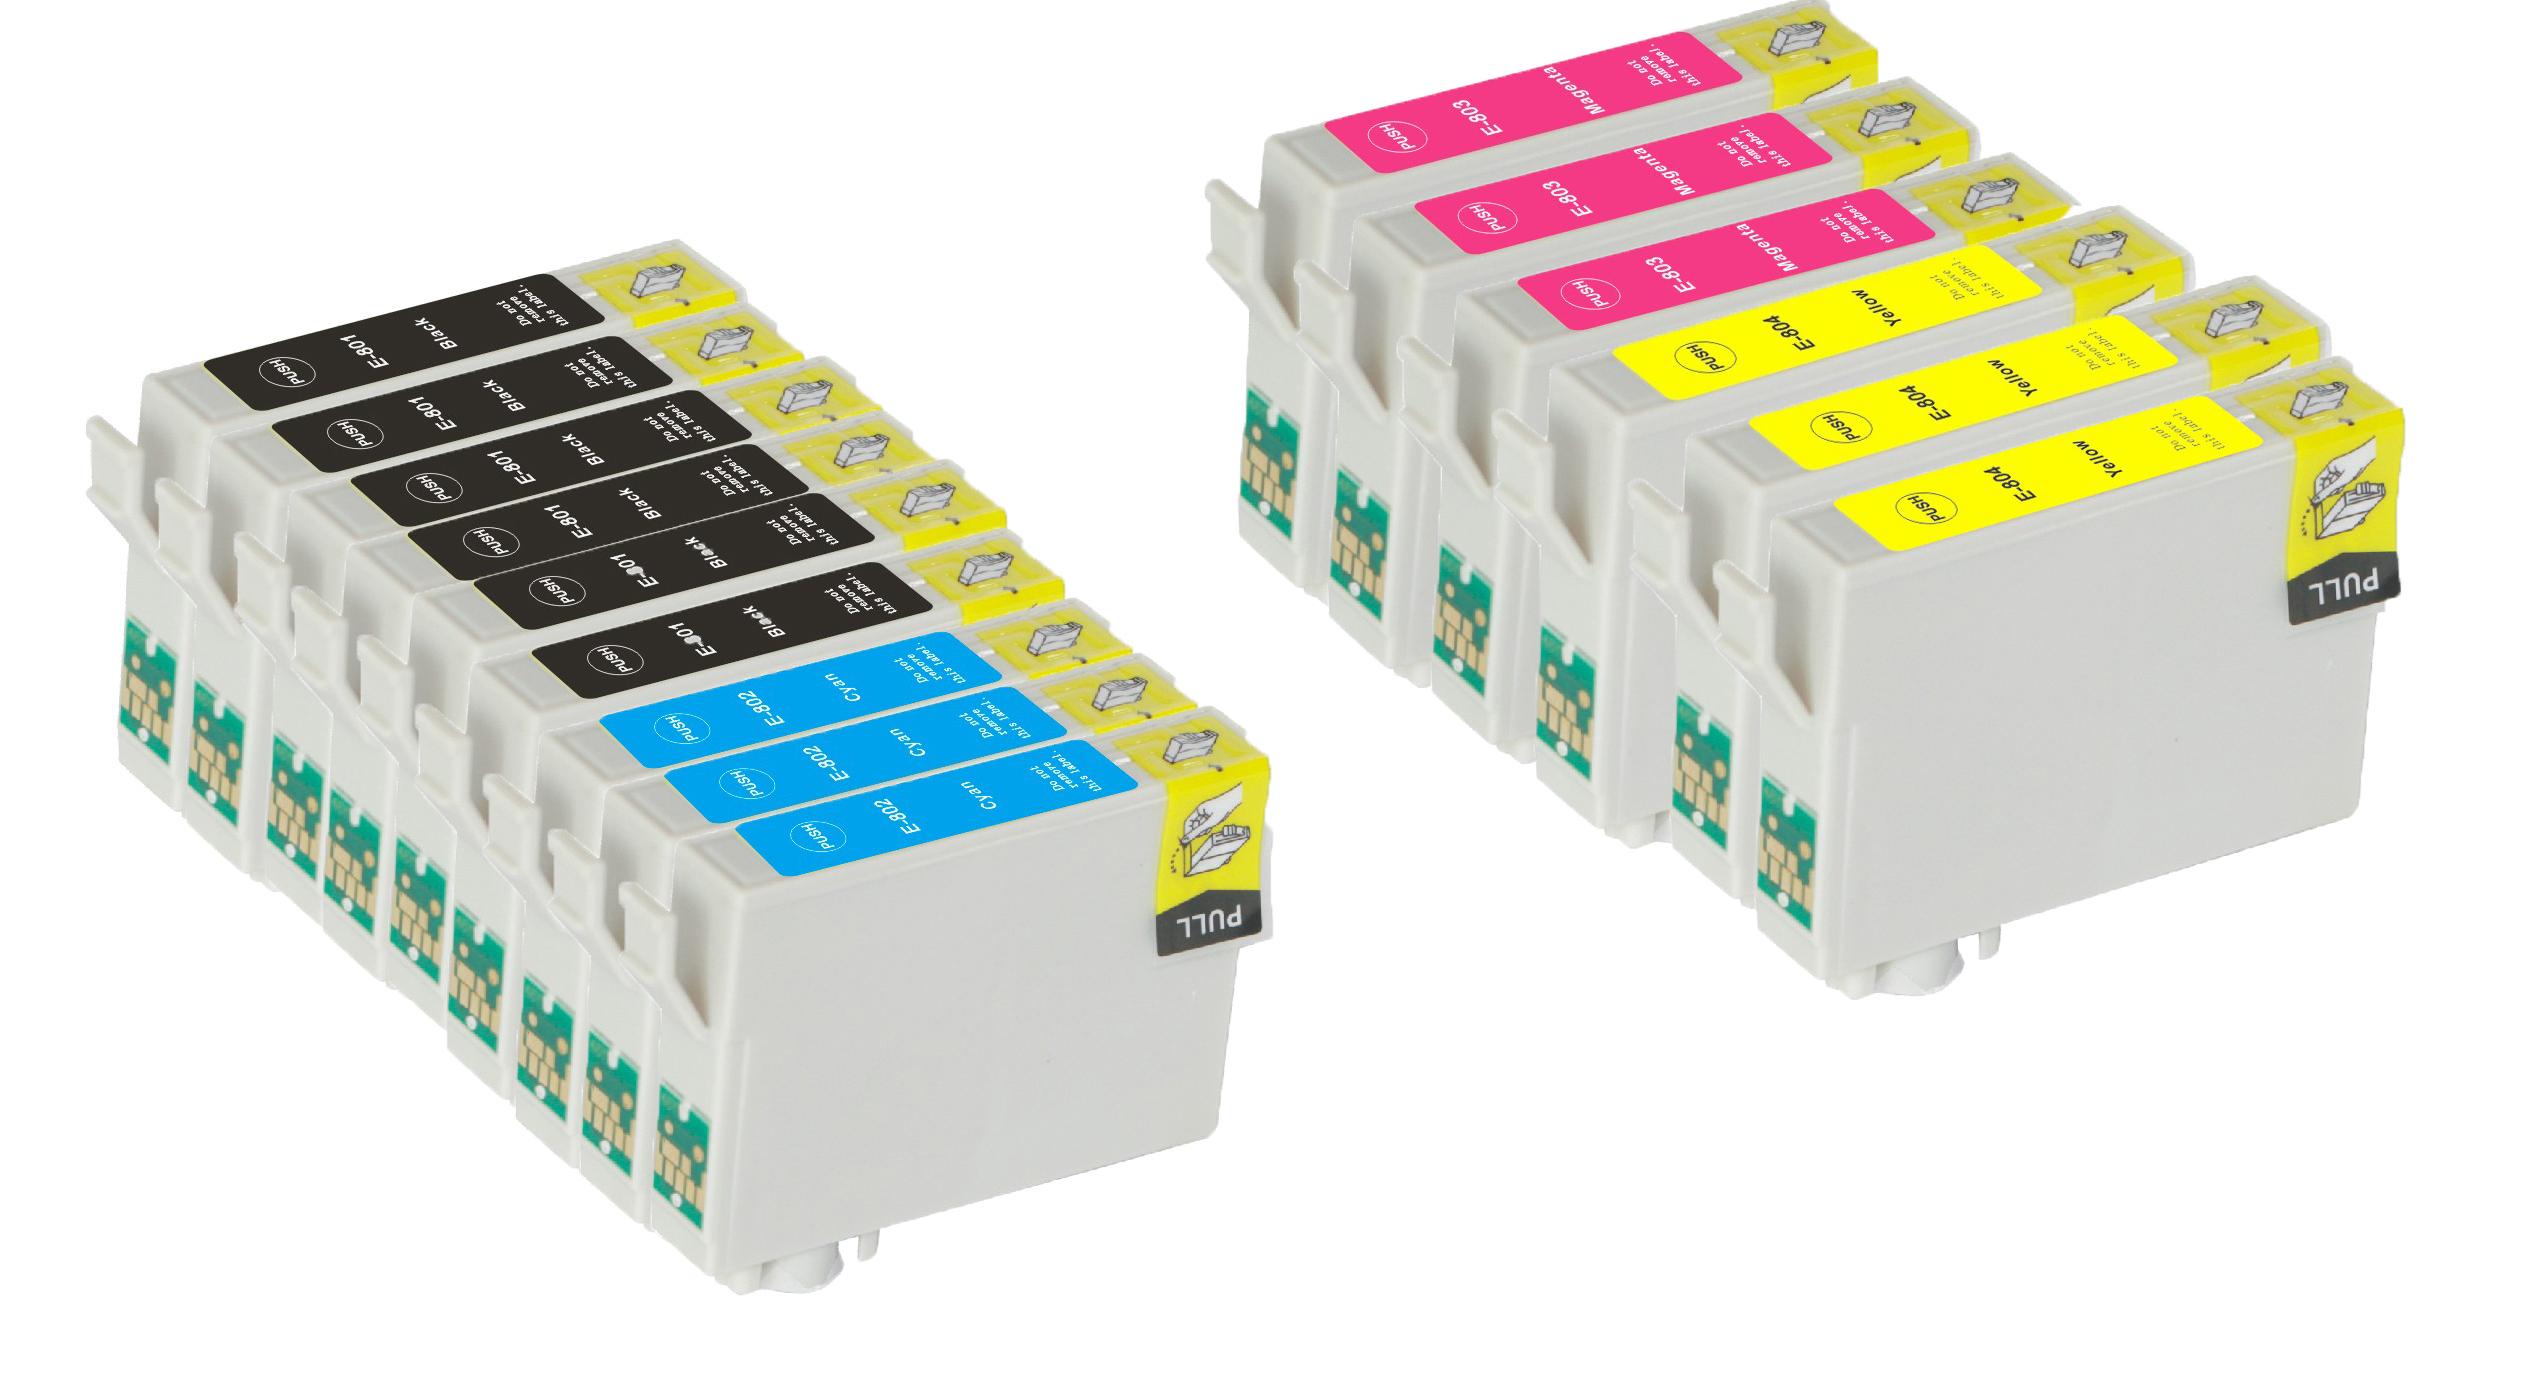 Kompatibel Epson T0801/T0802/T0803/T0804 combo pack 15 stk bläckpatron 211,5 ml